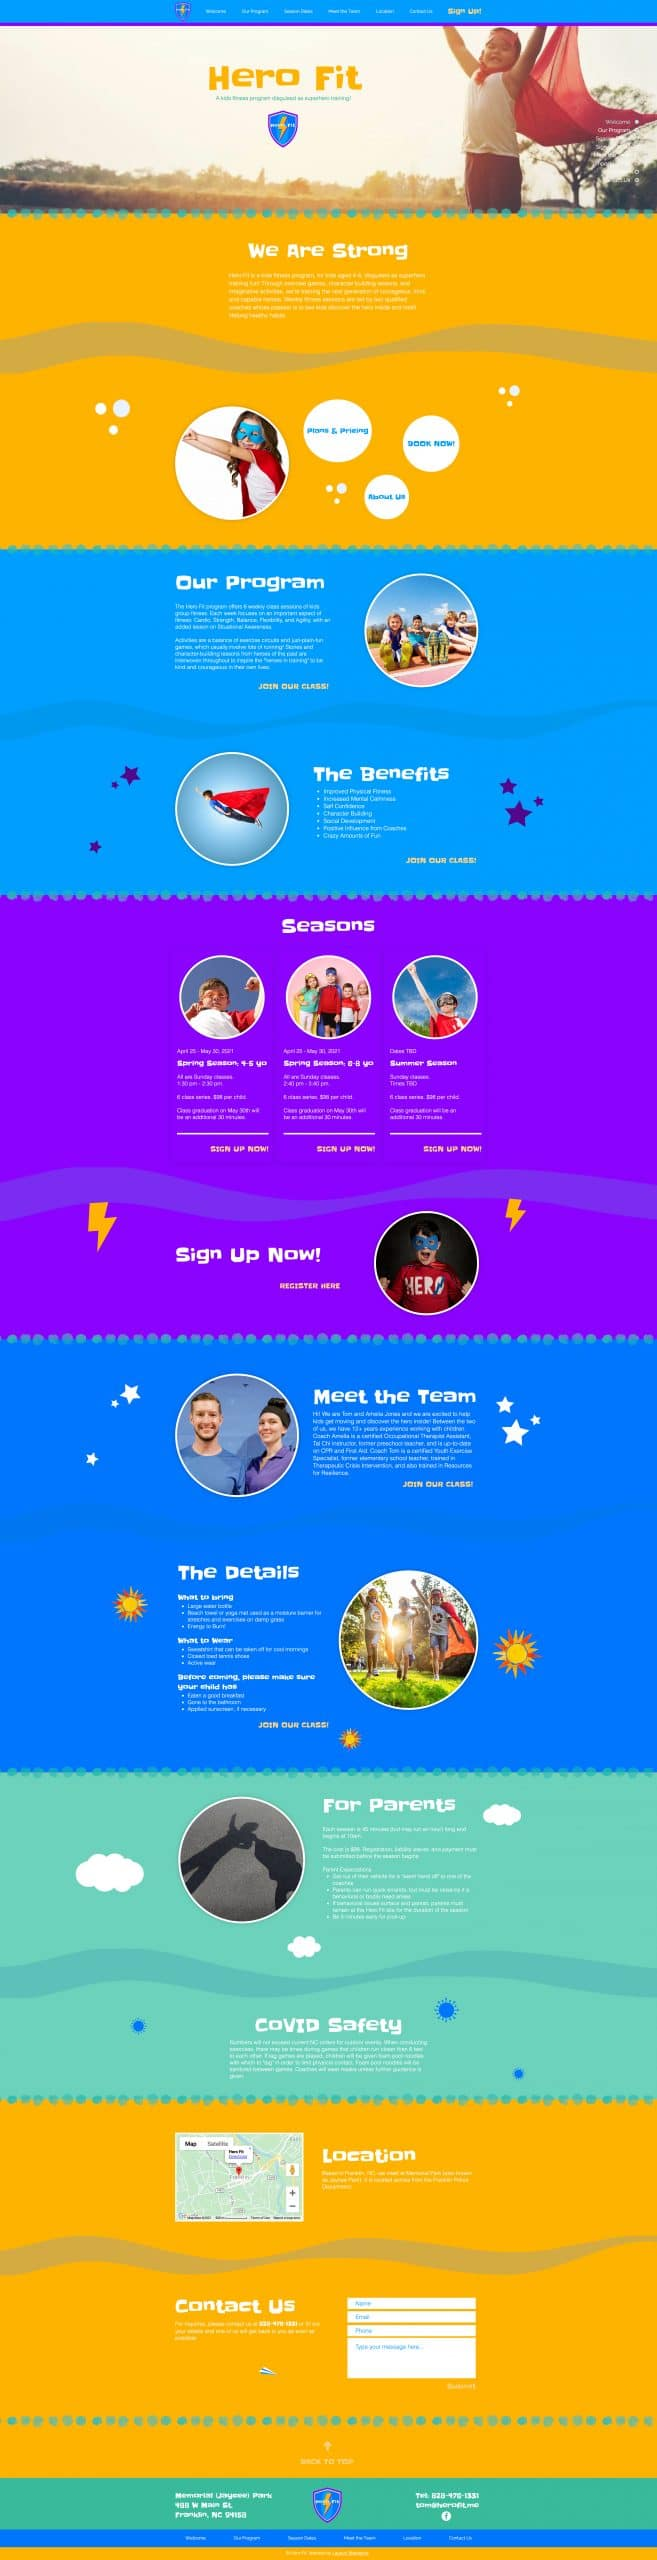 Hero Fit Website